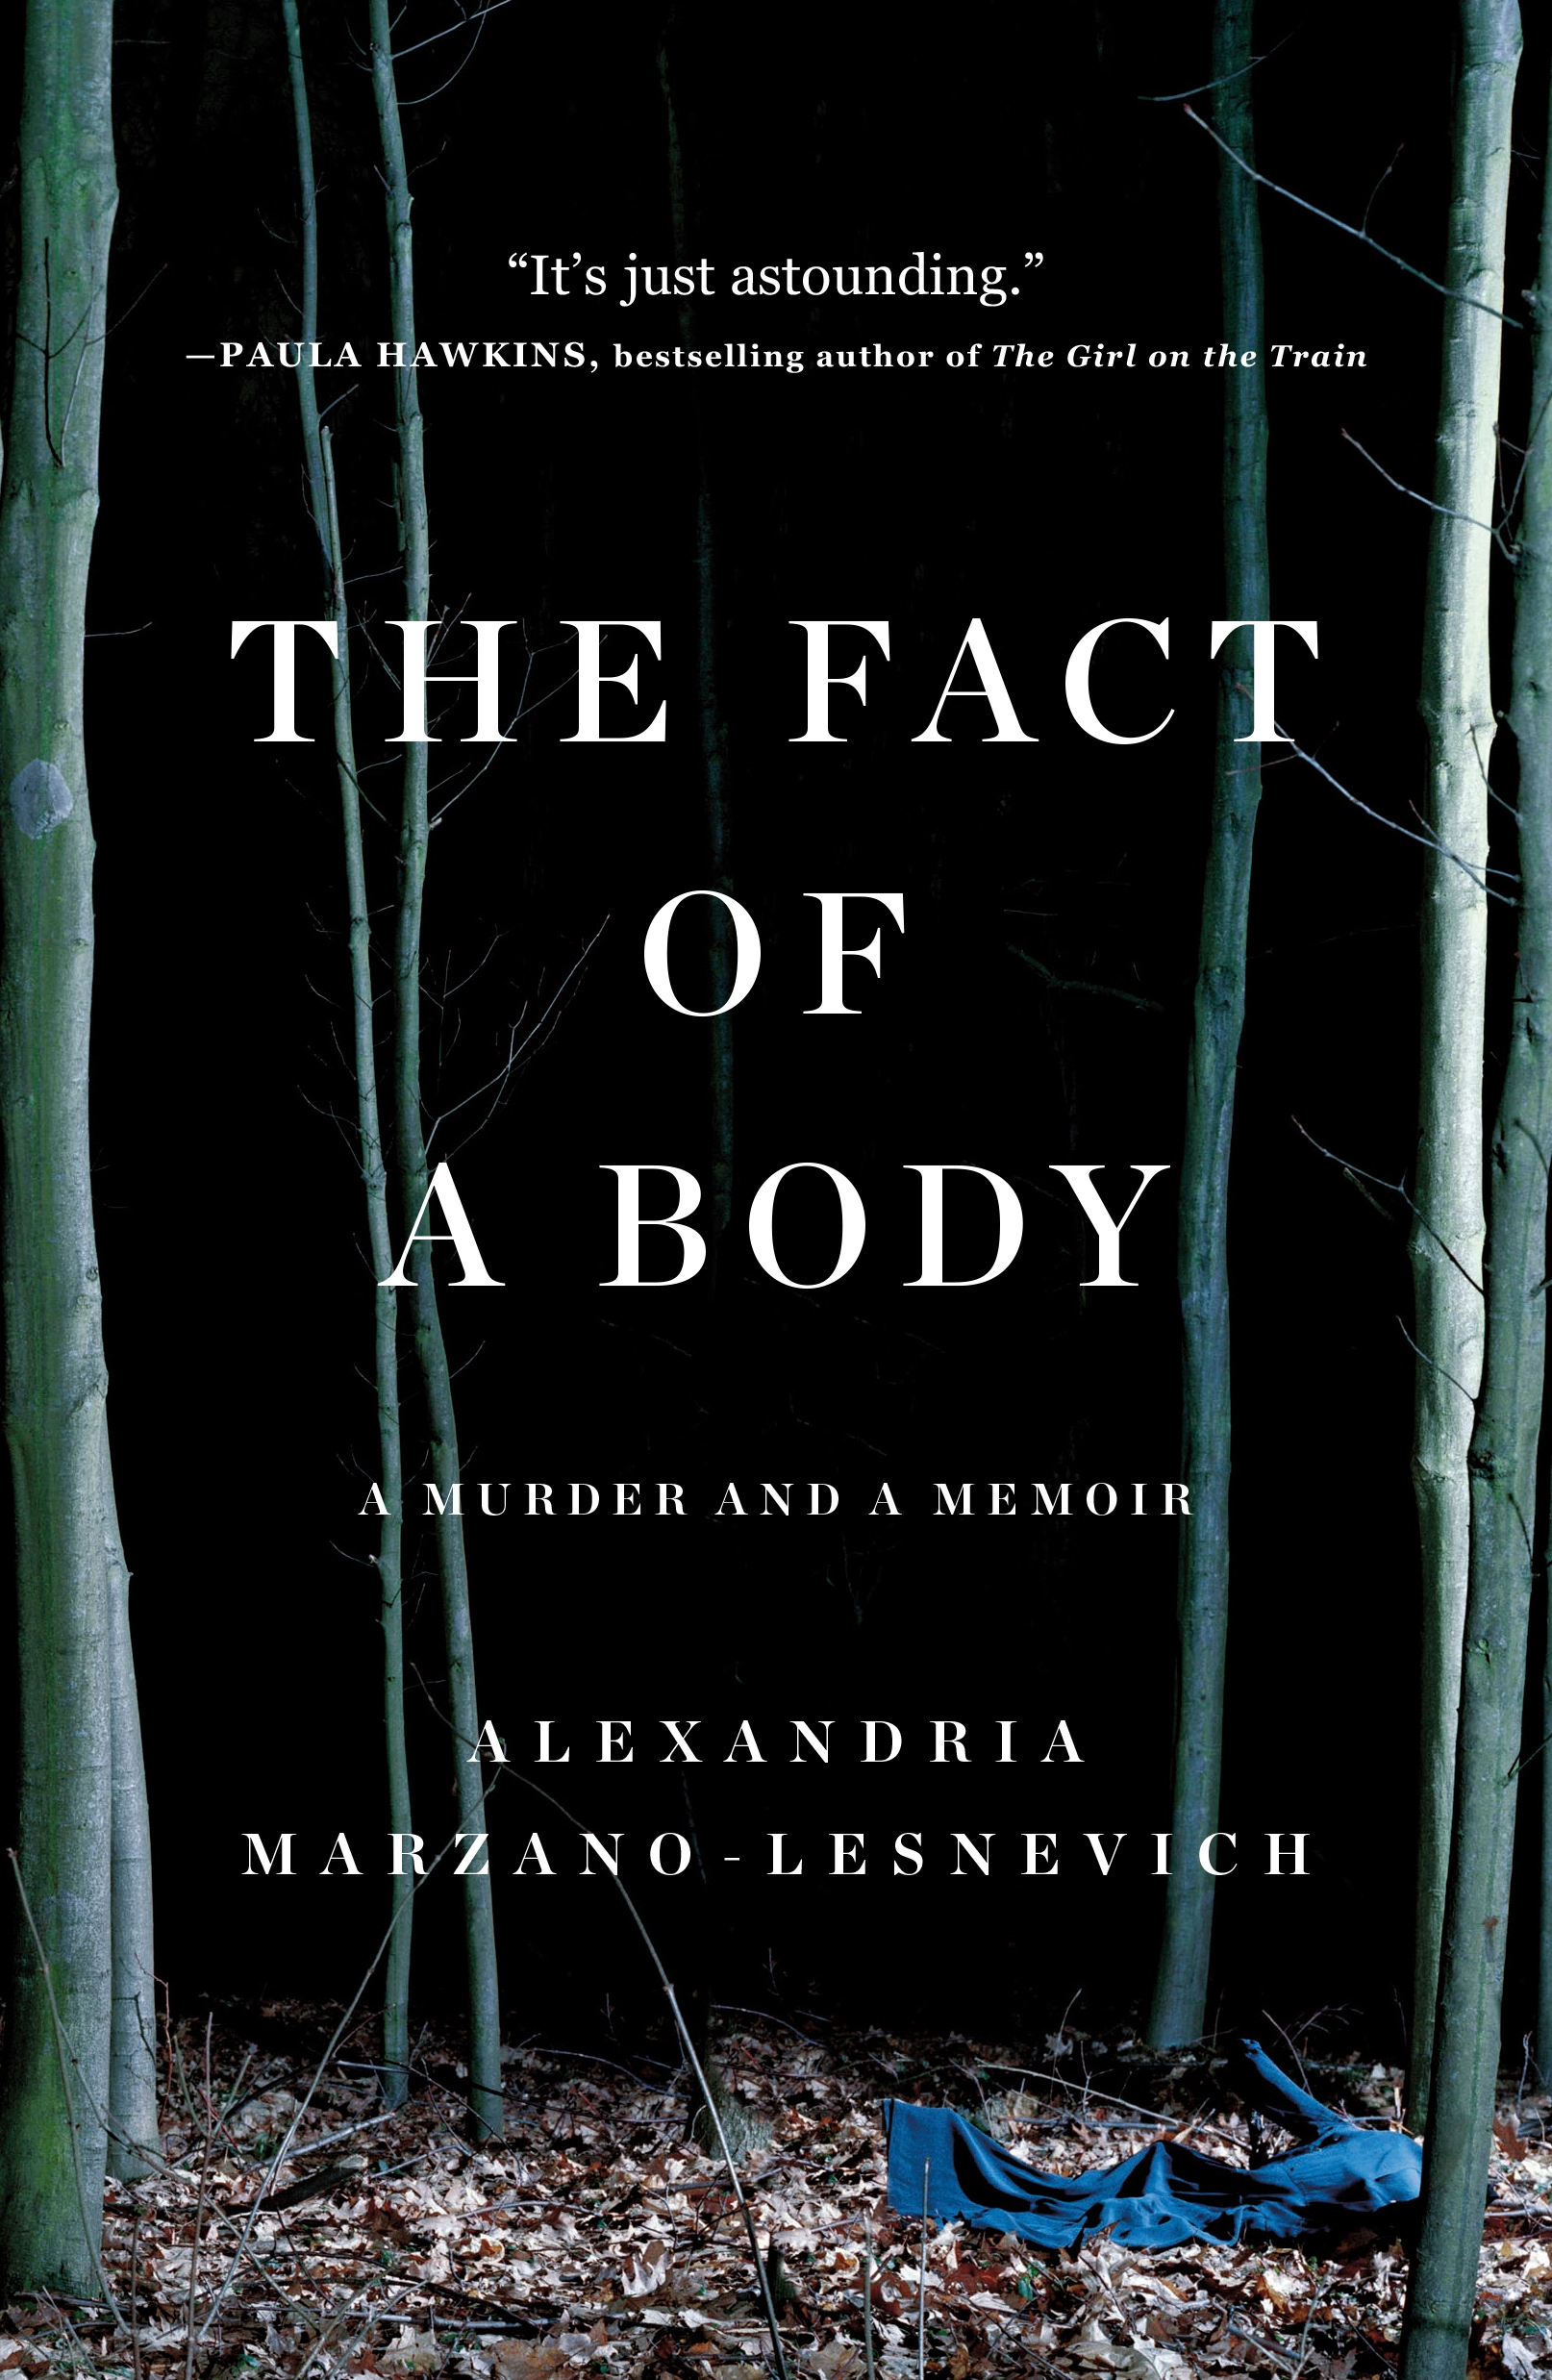 The Fact of a Body A Murder and a Memoir